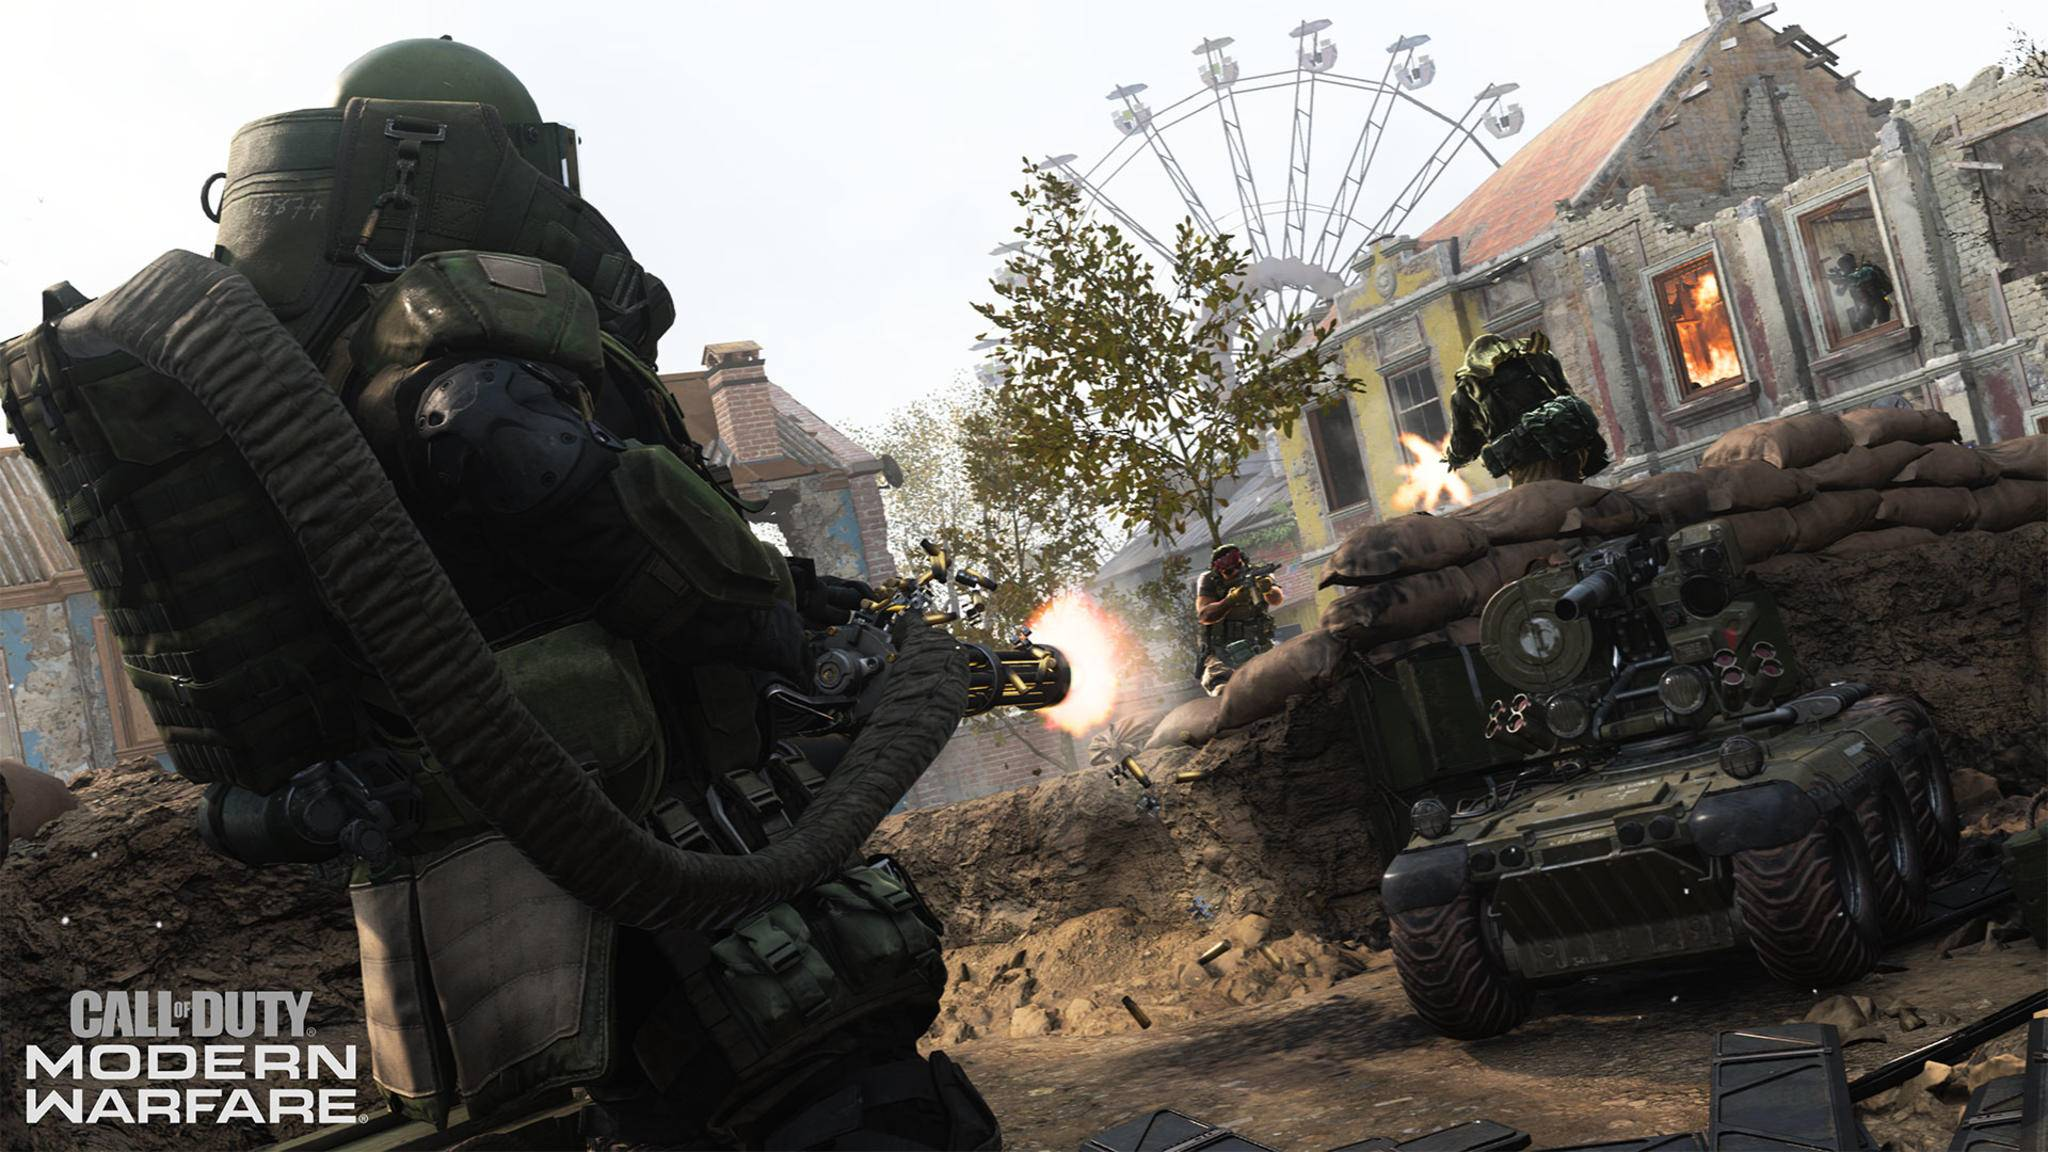 call-of-duty-modern-warfare-multiplayer-screenshot-07